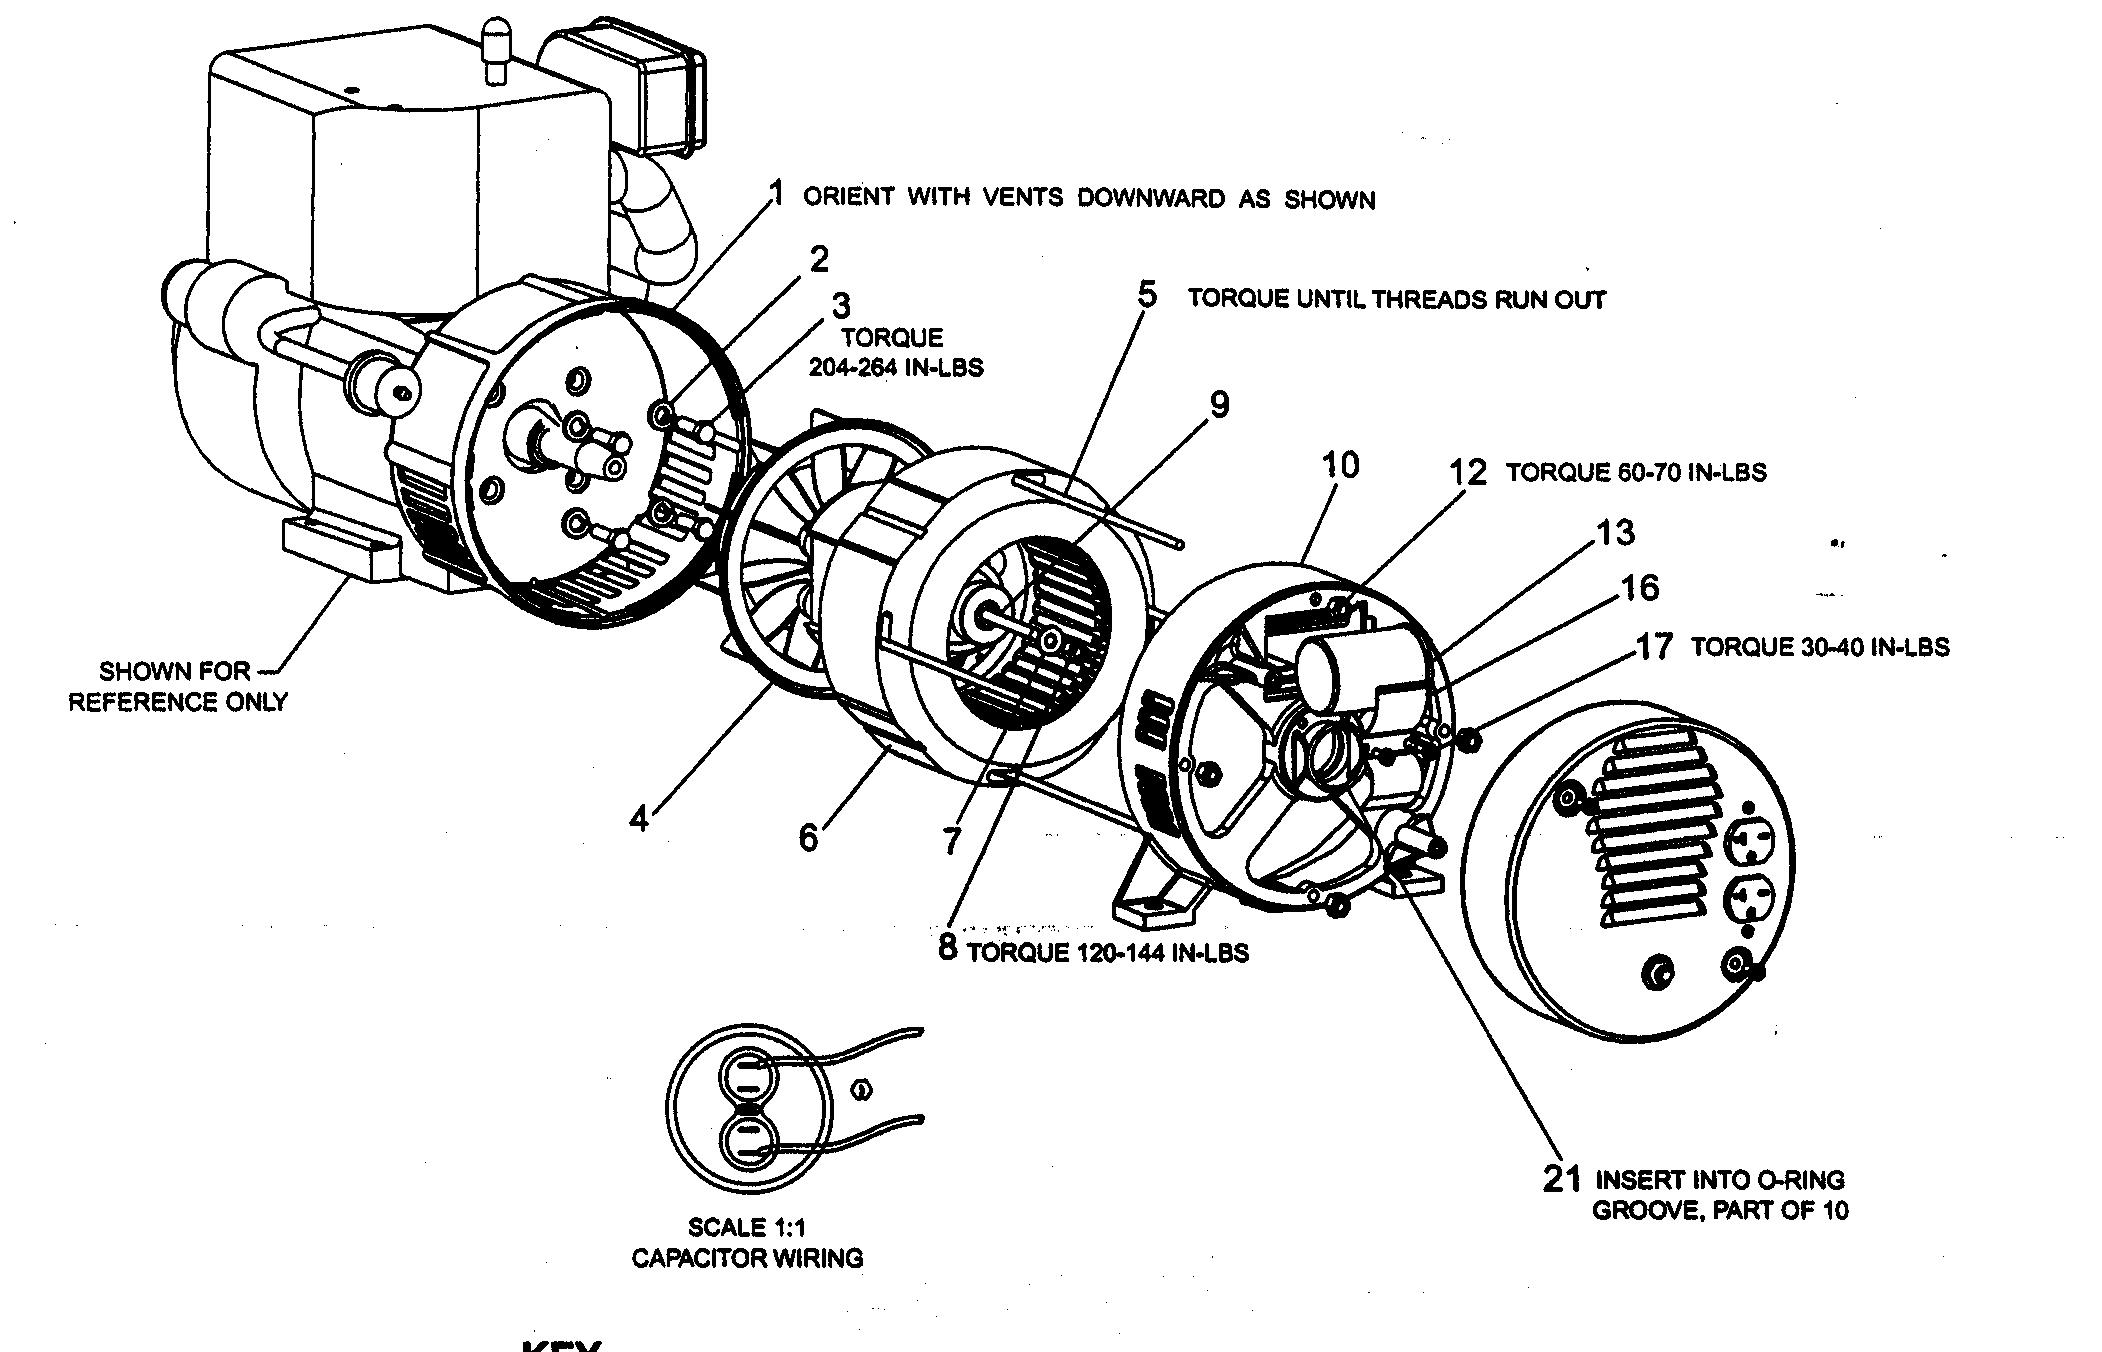 30 Amp Dryer Wiring Diagram